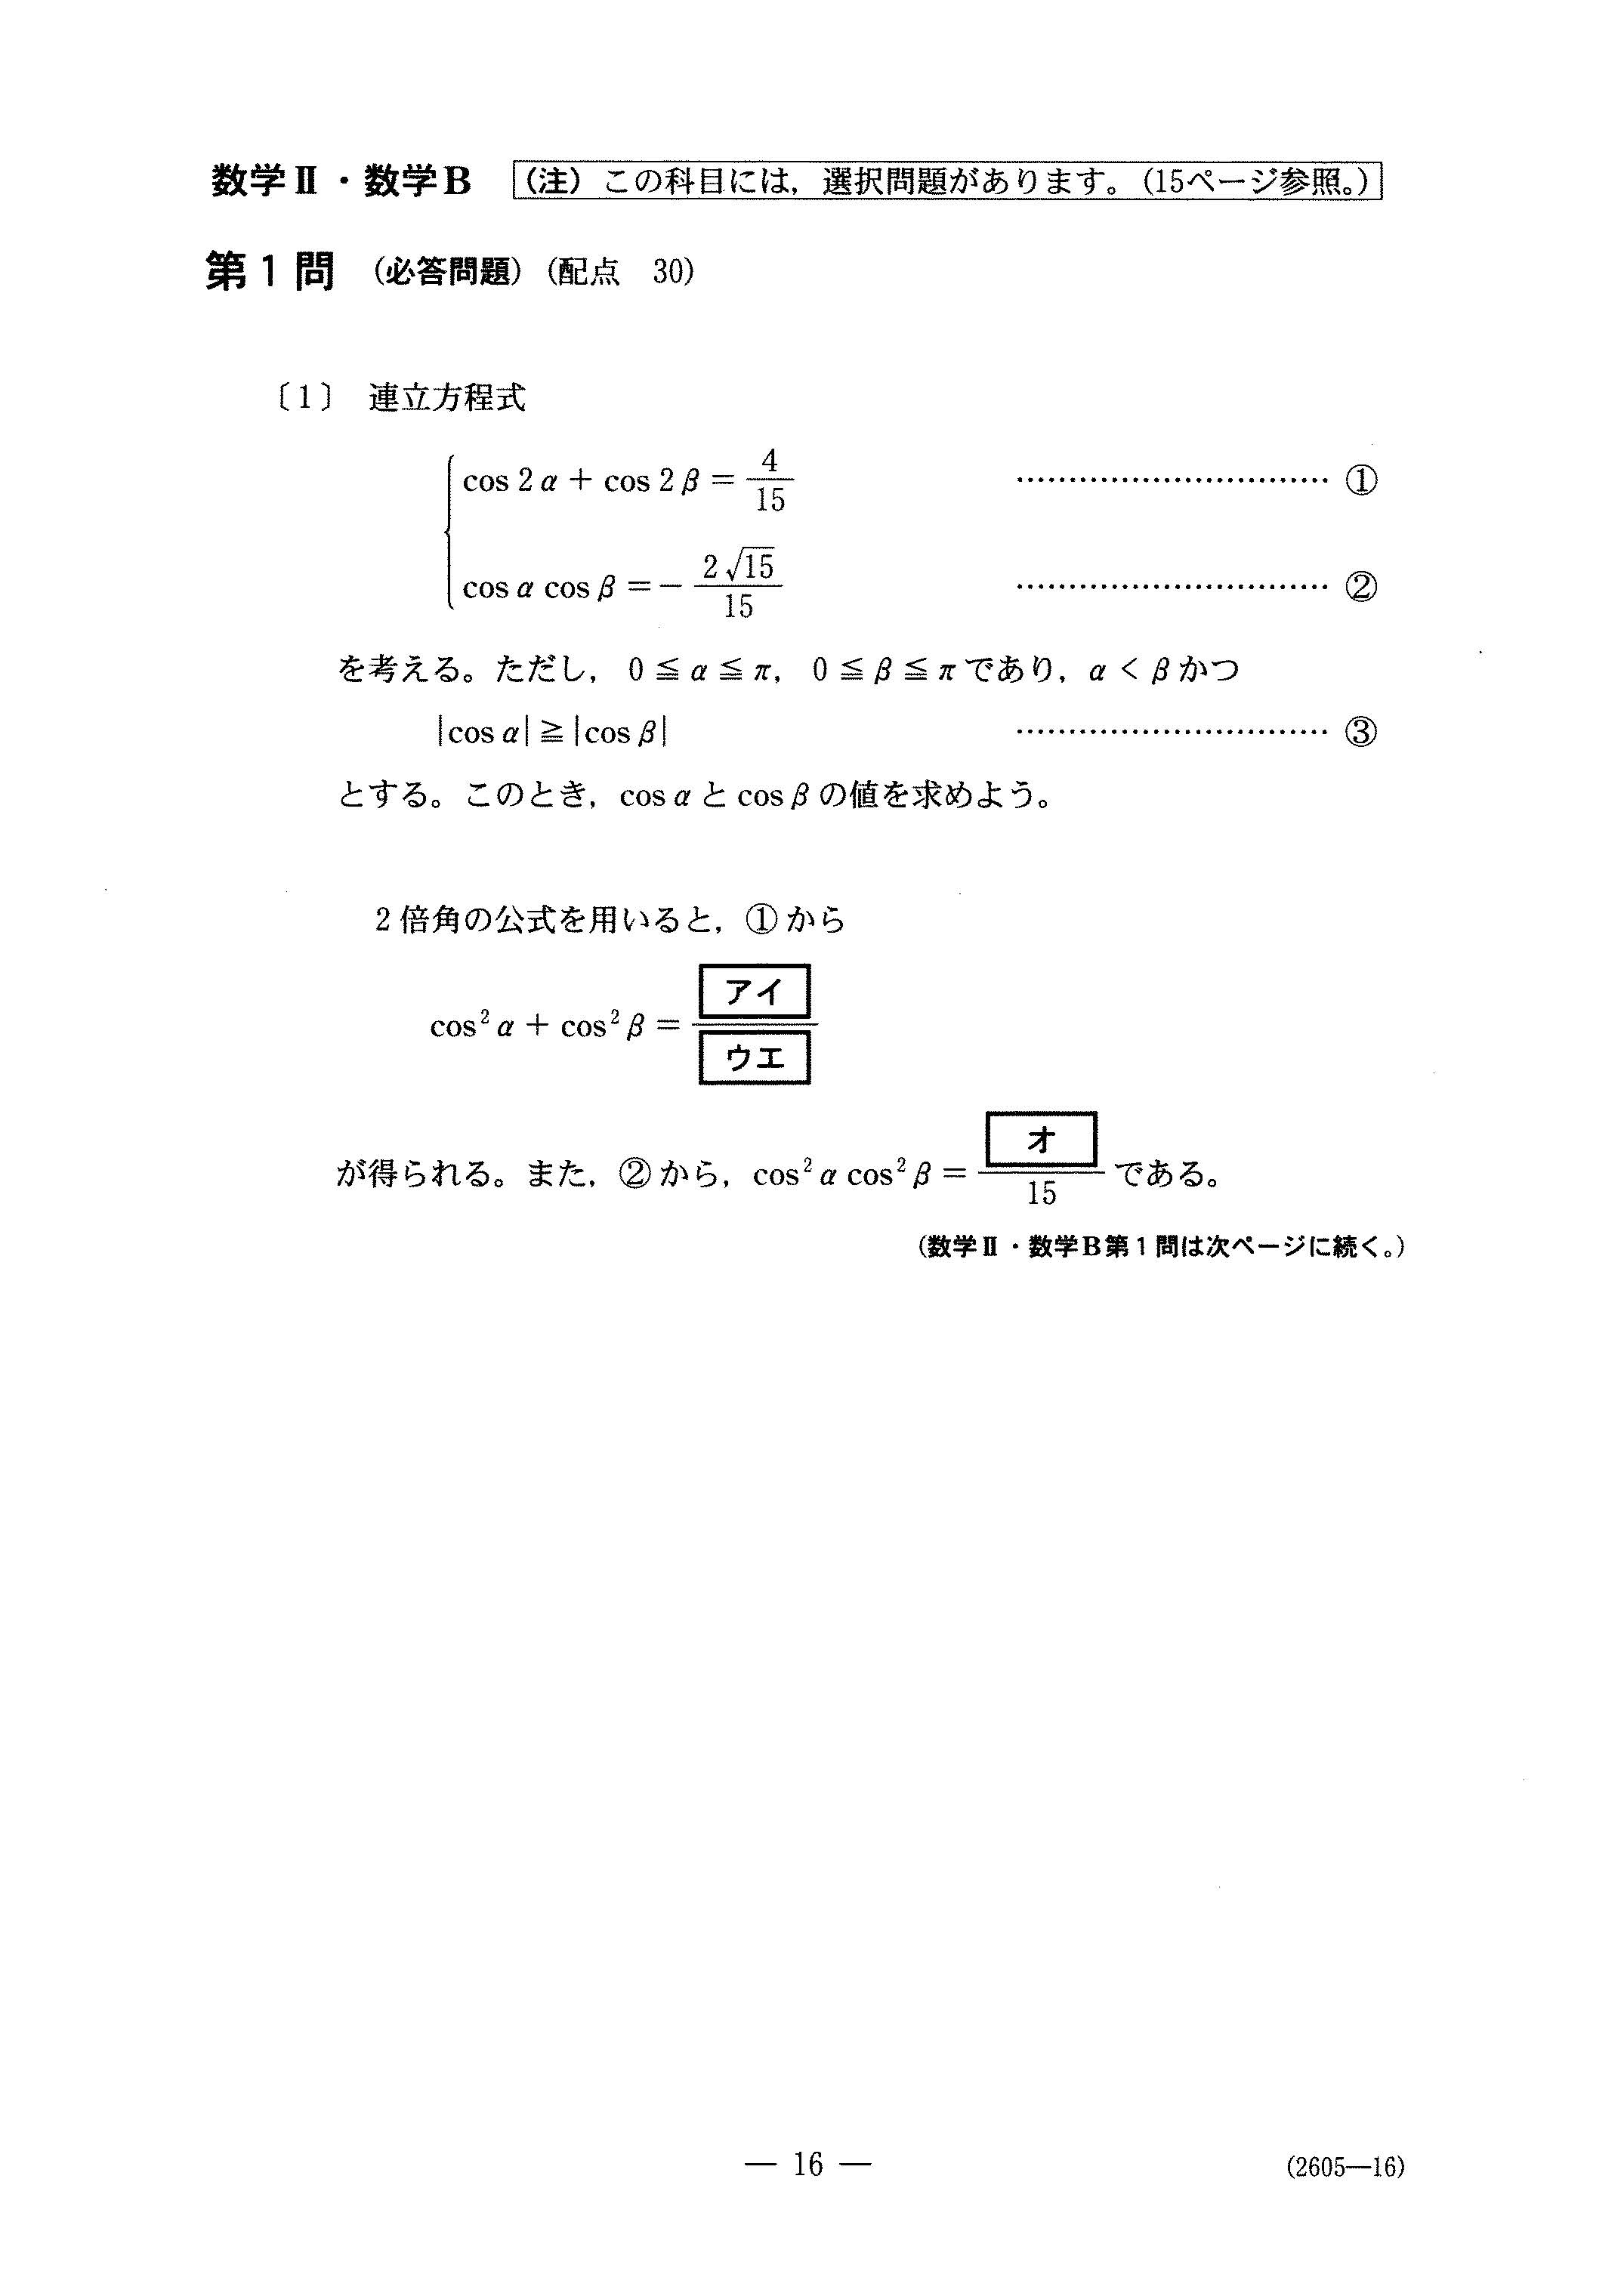 H29数学_数学Ⅱ・数学B 大学入試センター試験過去問